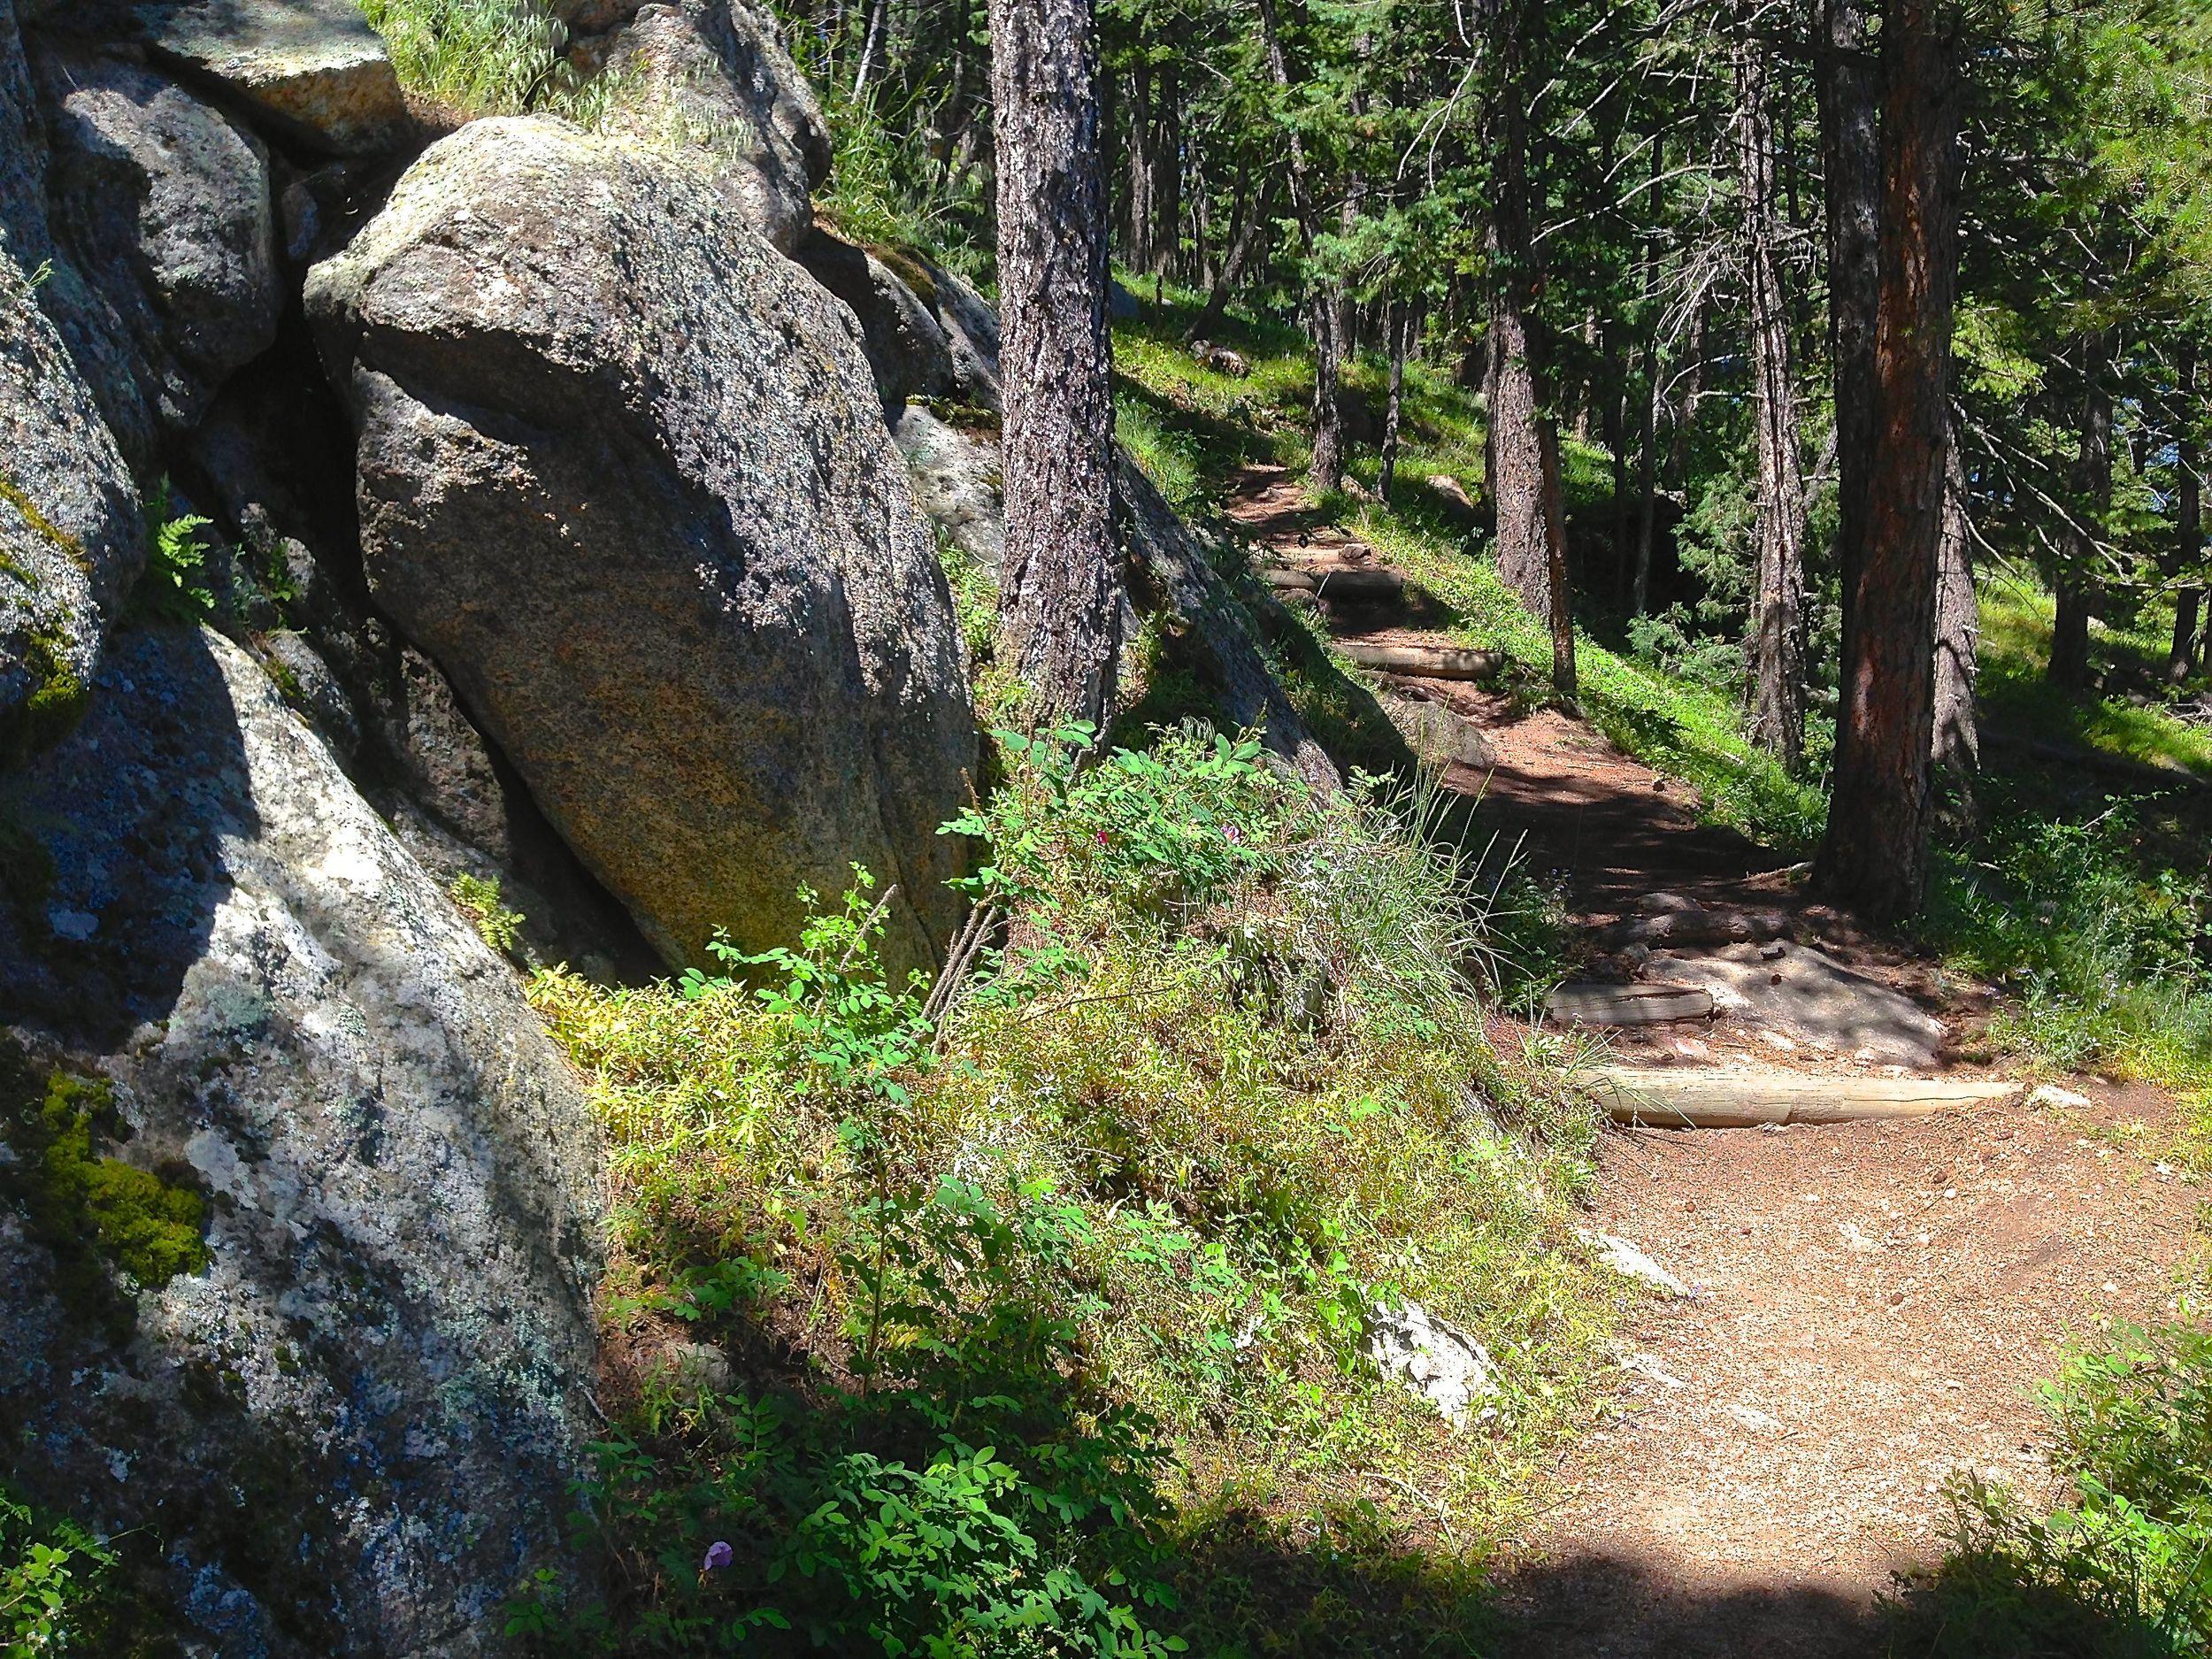 Boy Scout circles Flagstaff Summit's beautiful picnic spots